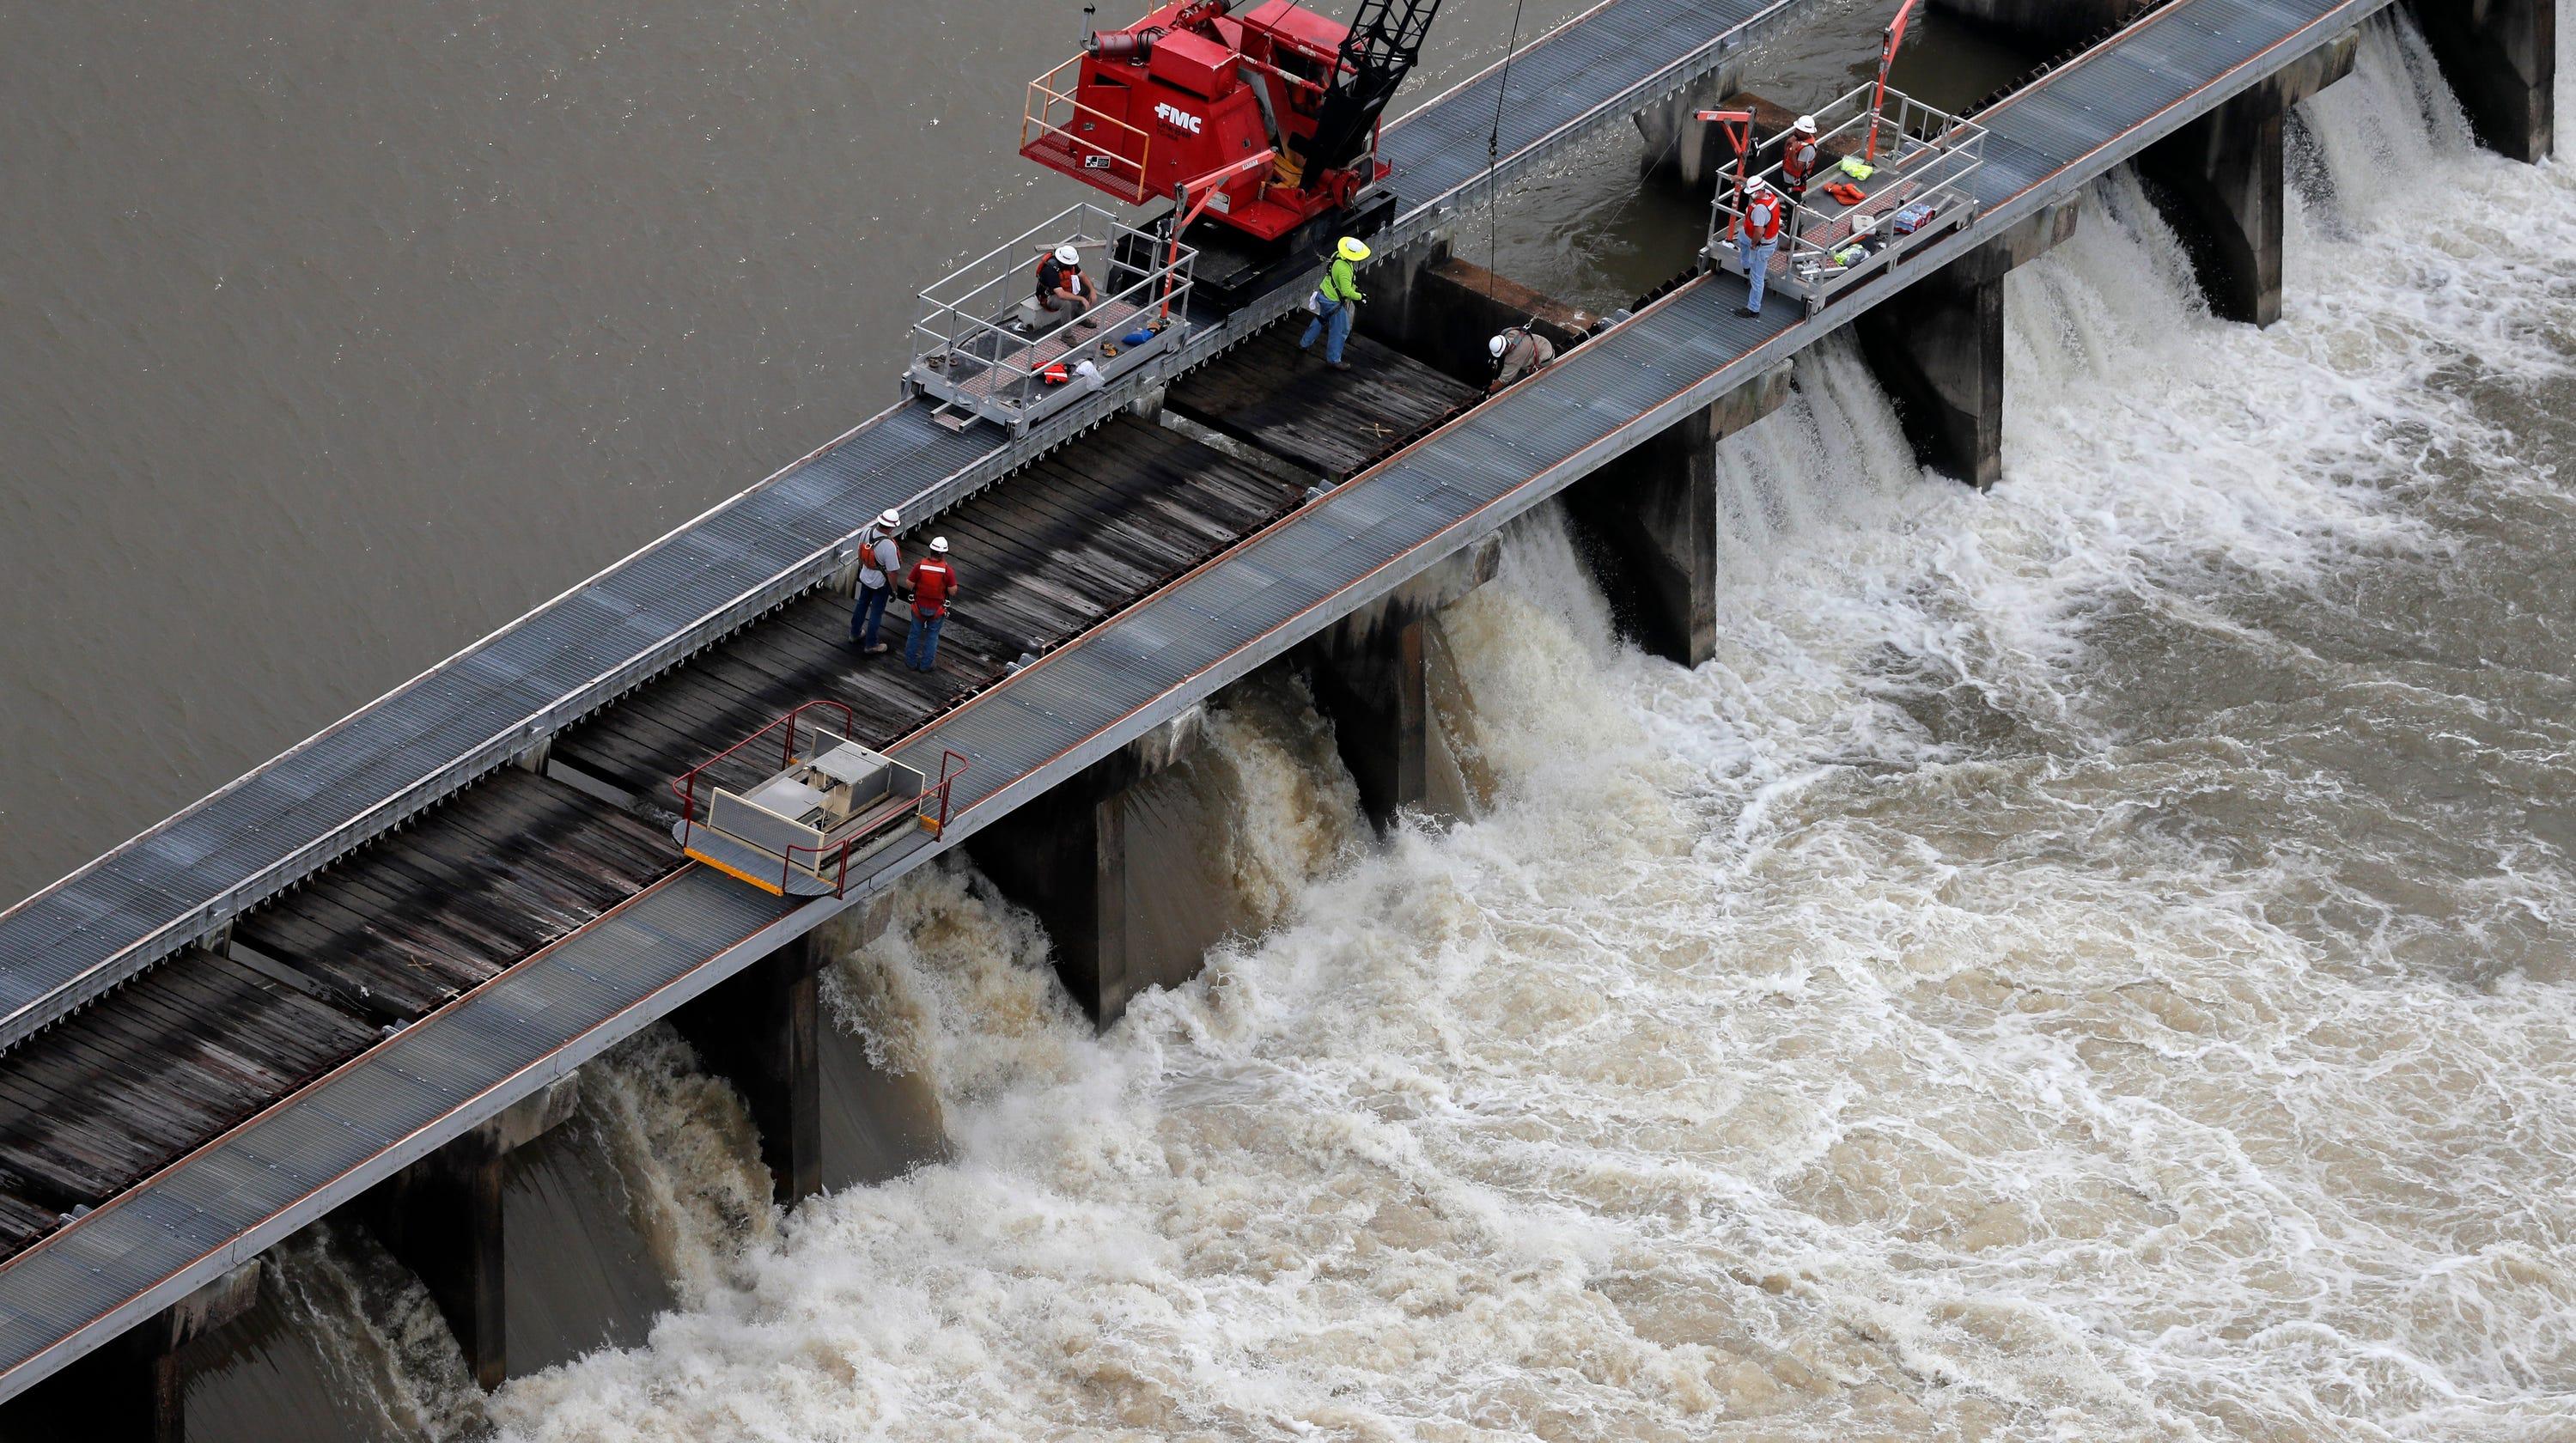 New Orleans Flooding: Heavy Rains Slam City